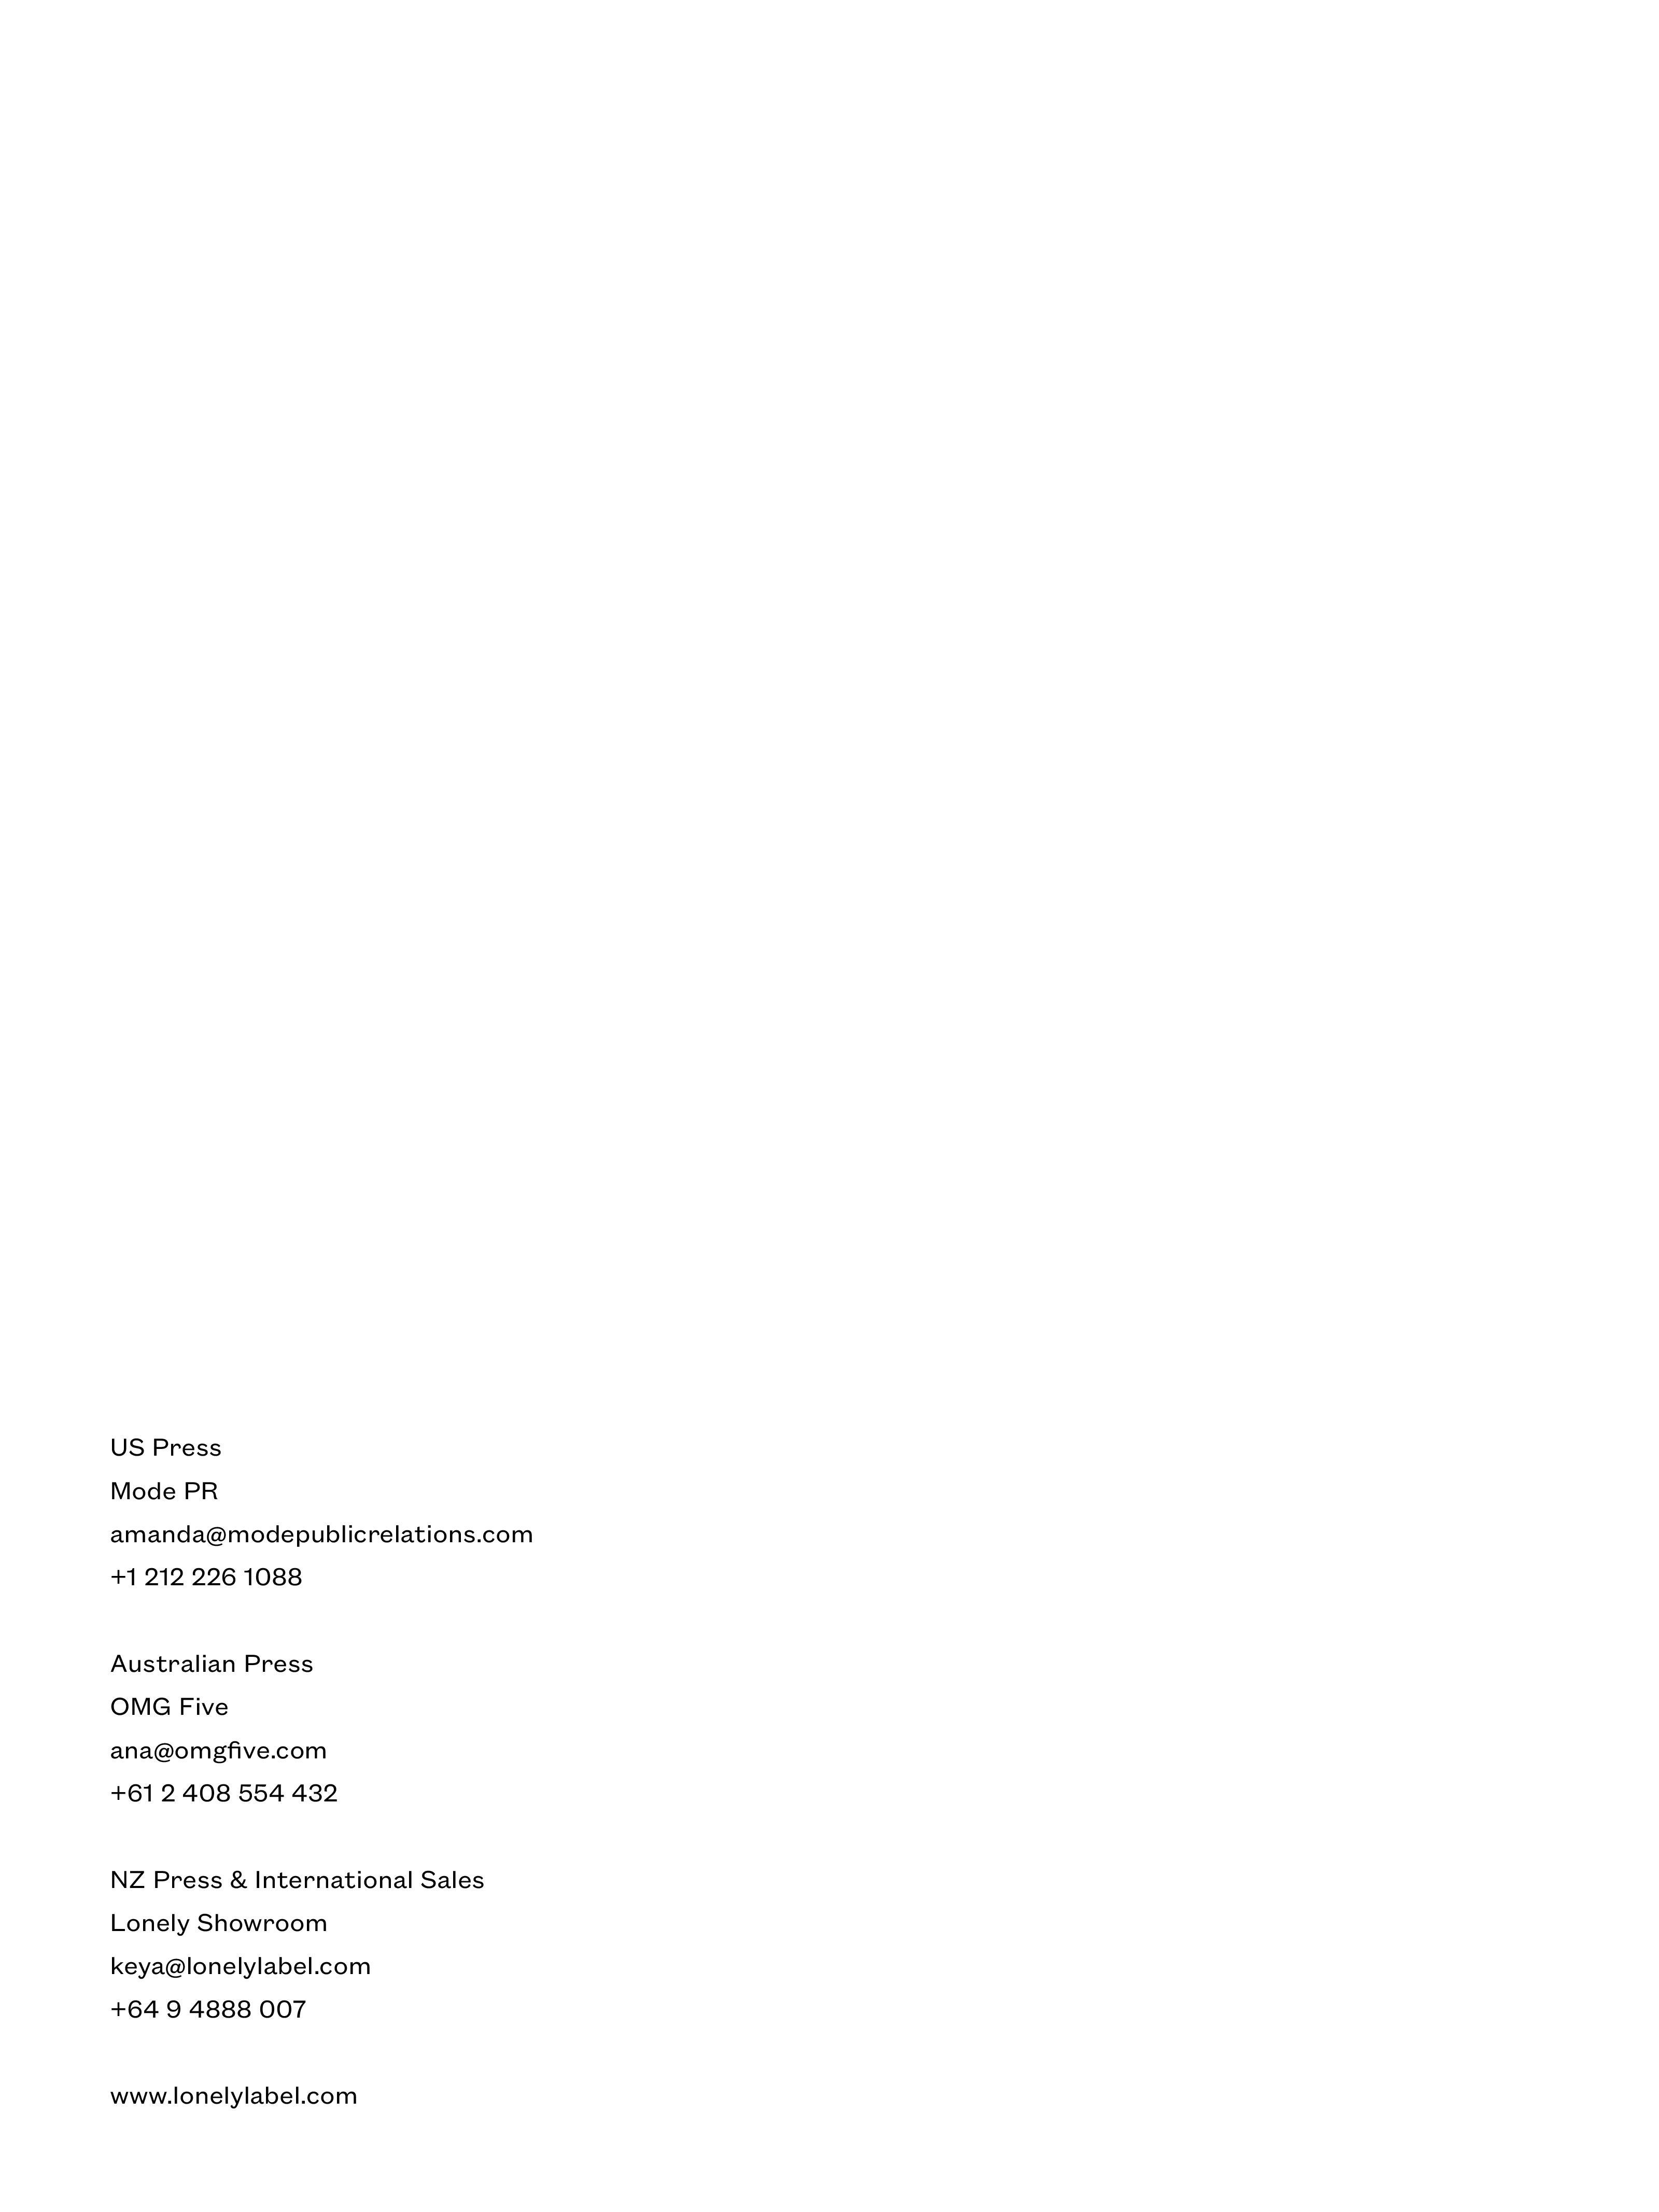 Lonely_Digi_Lookbook_Jessie-page-025